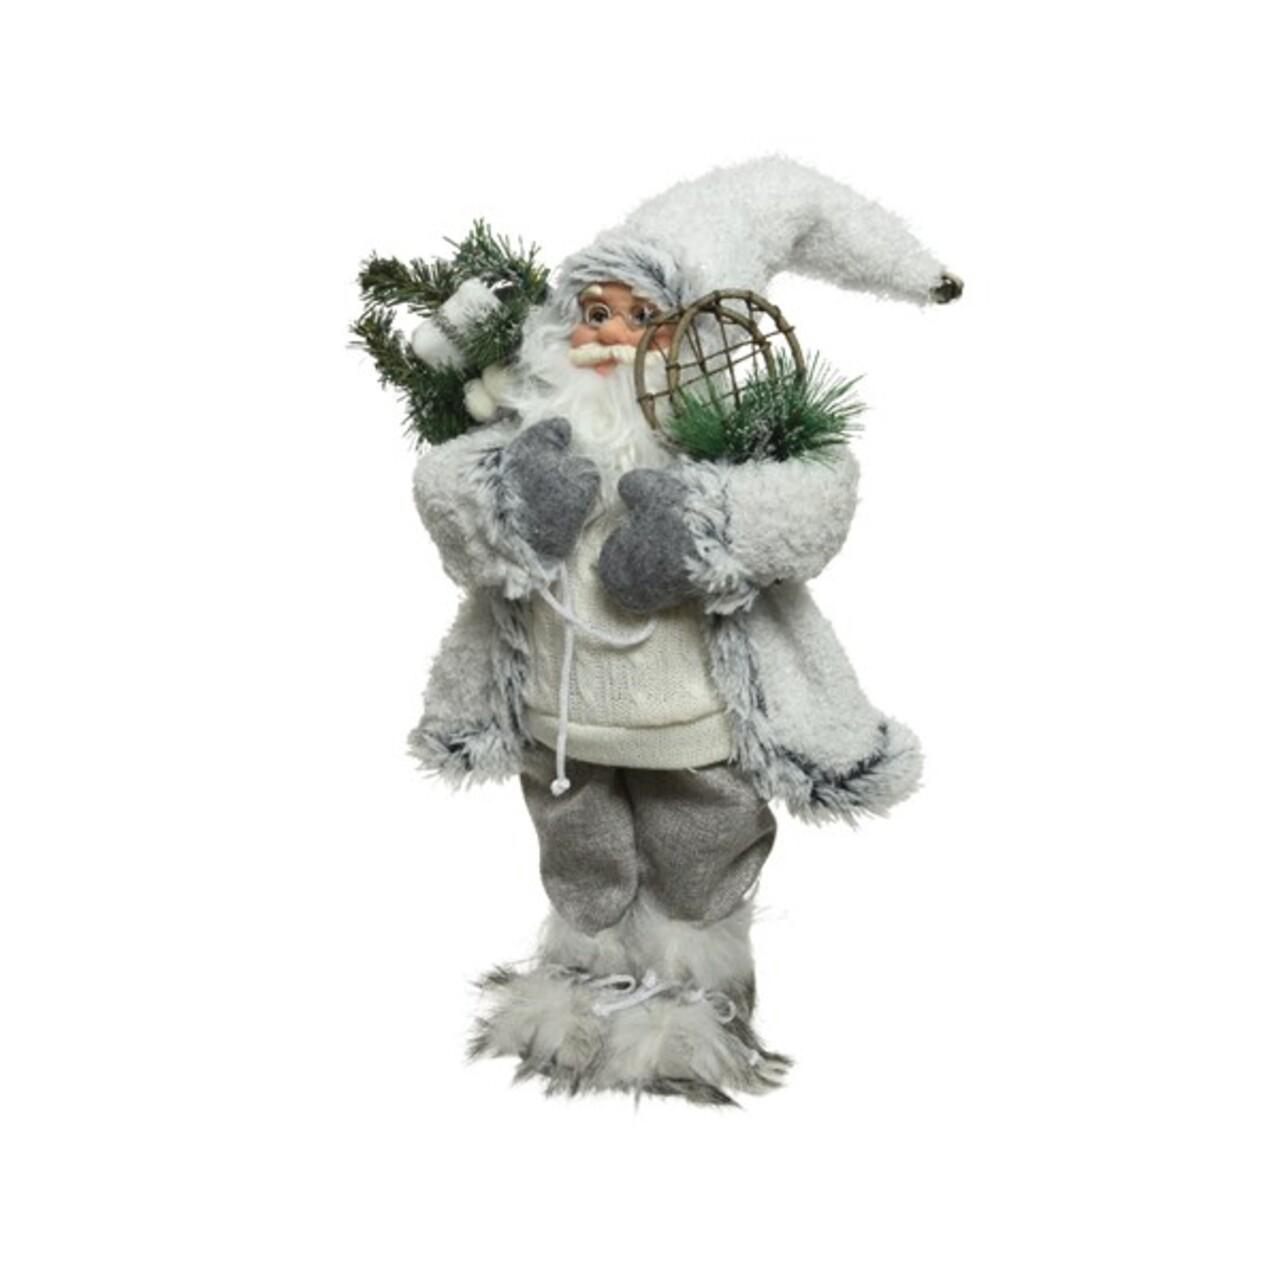 Decoratiune Santa w snow shoes, Decoris, H60 cm, poliester, alb